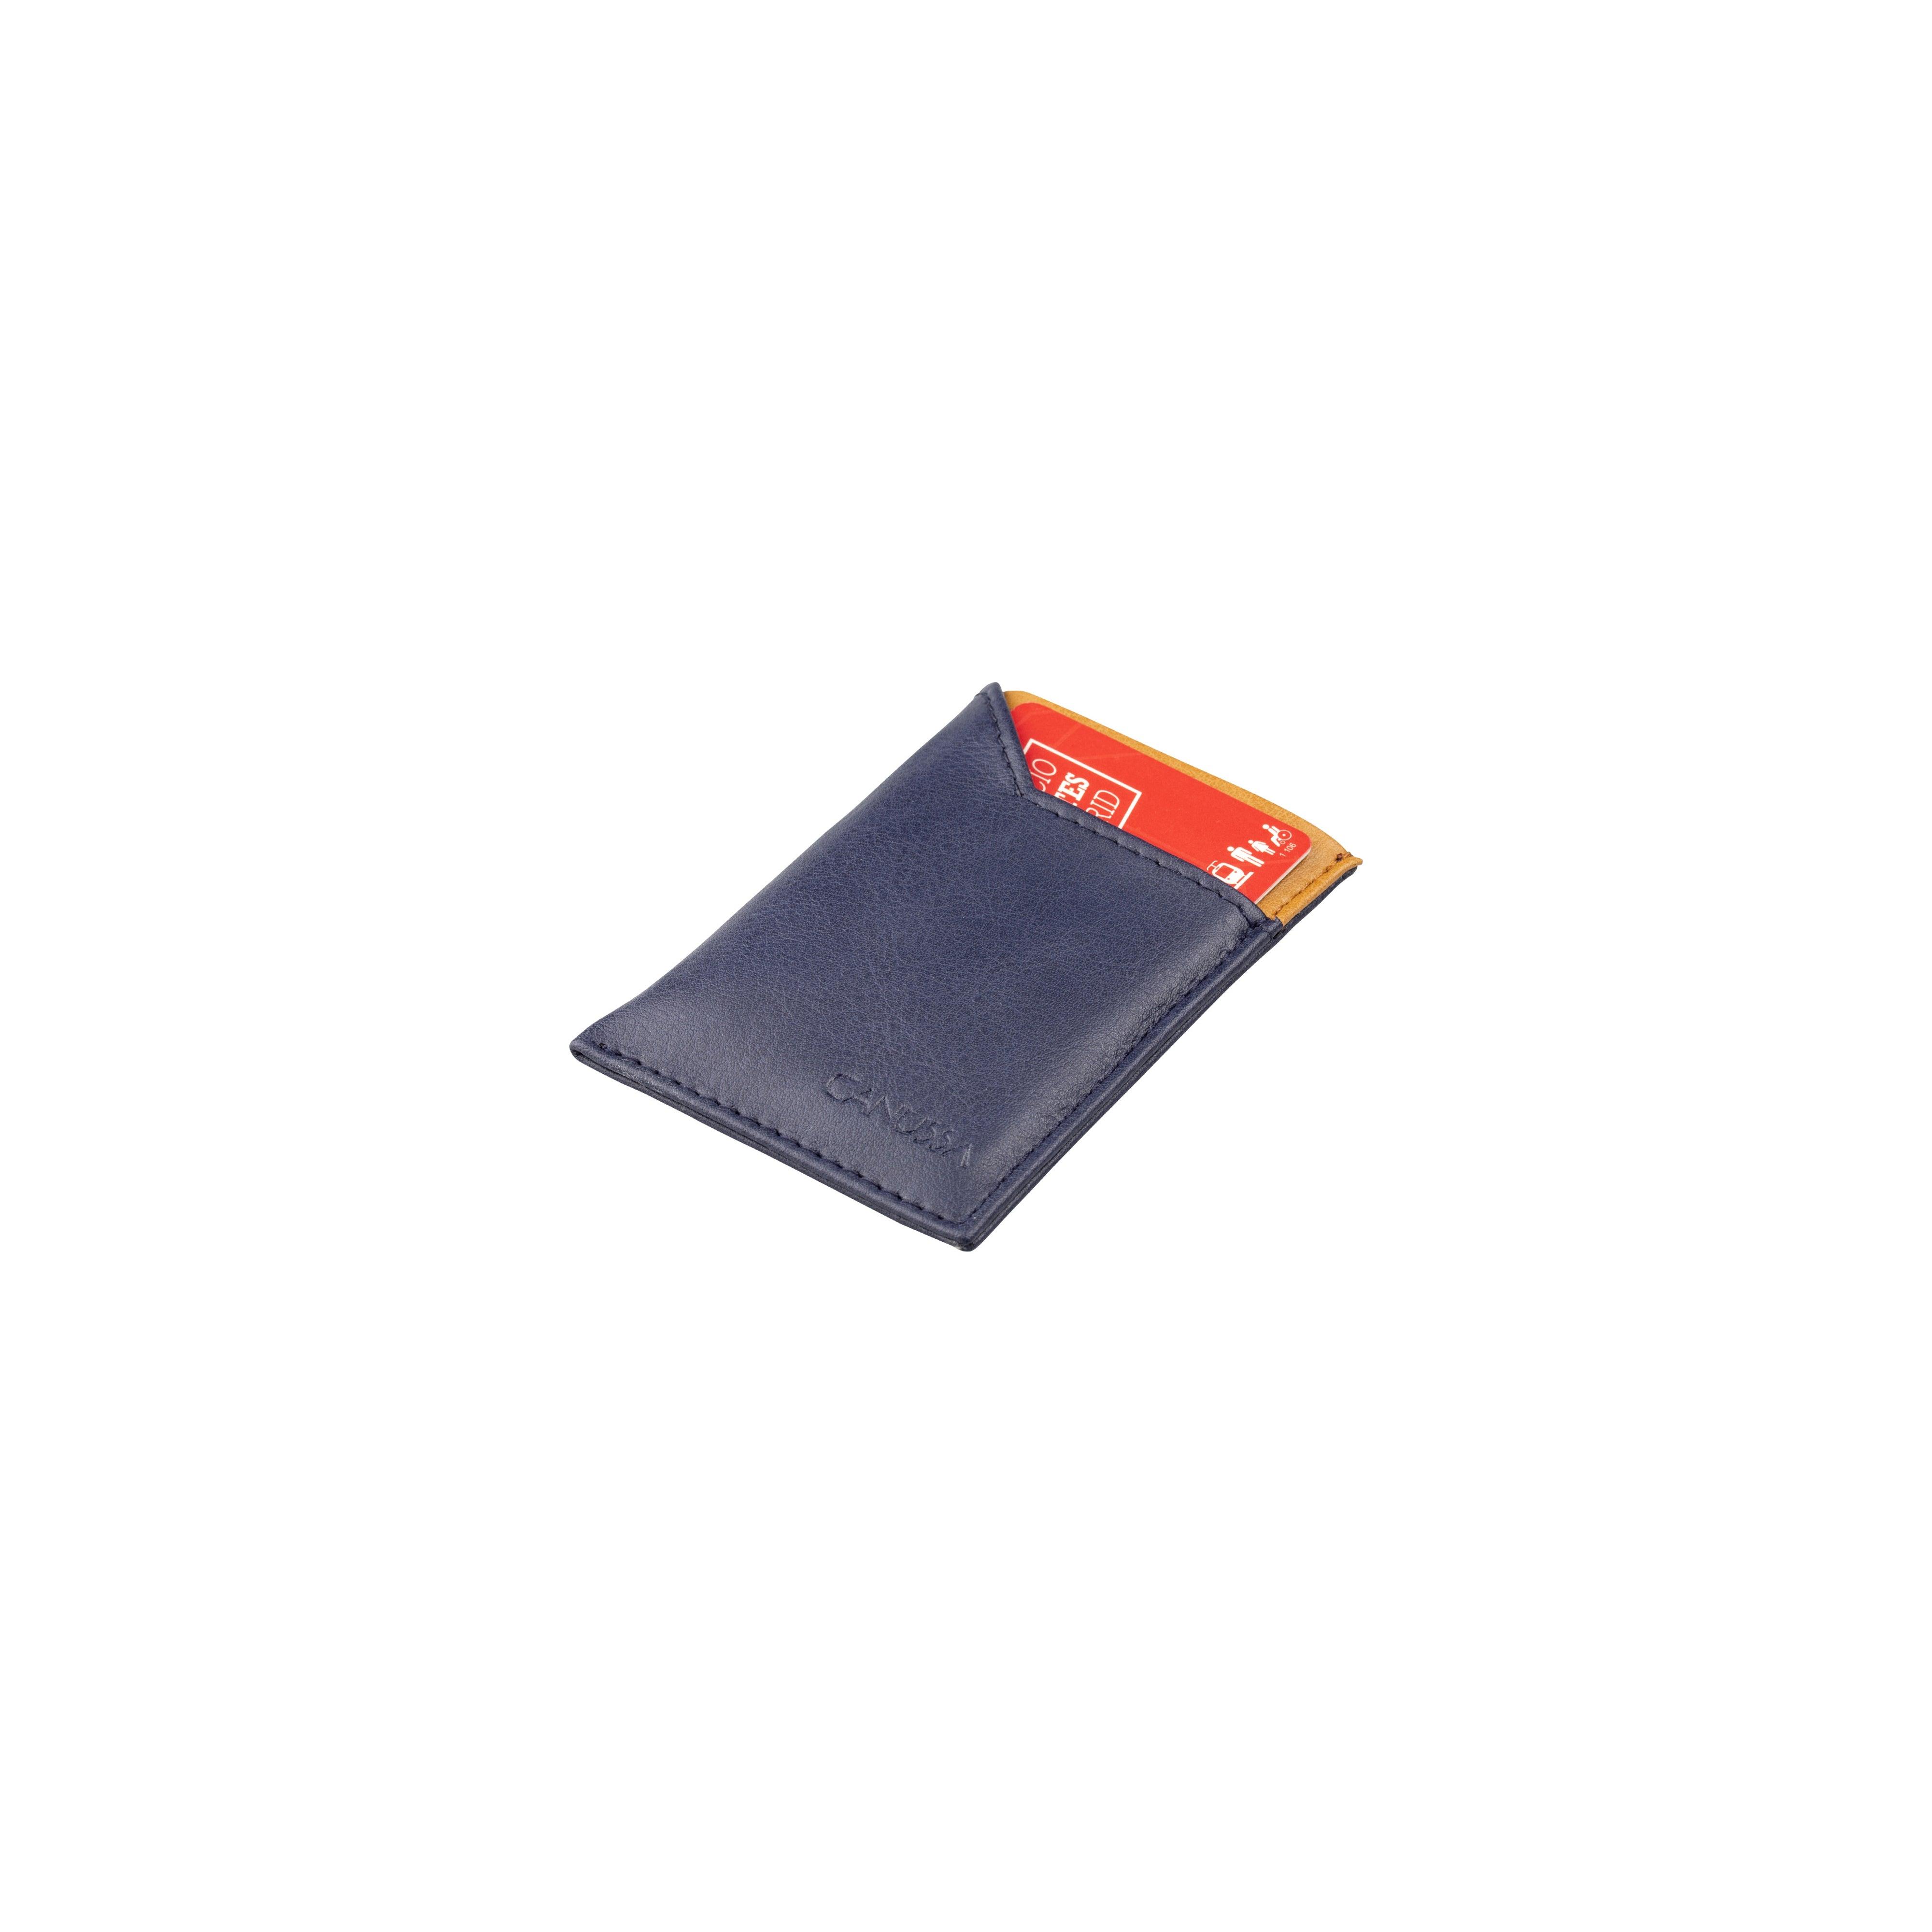 Slim Vegan Card holder - Blue/Camel